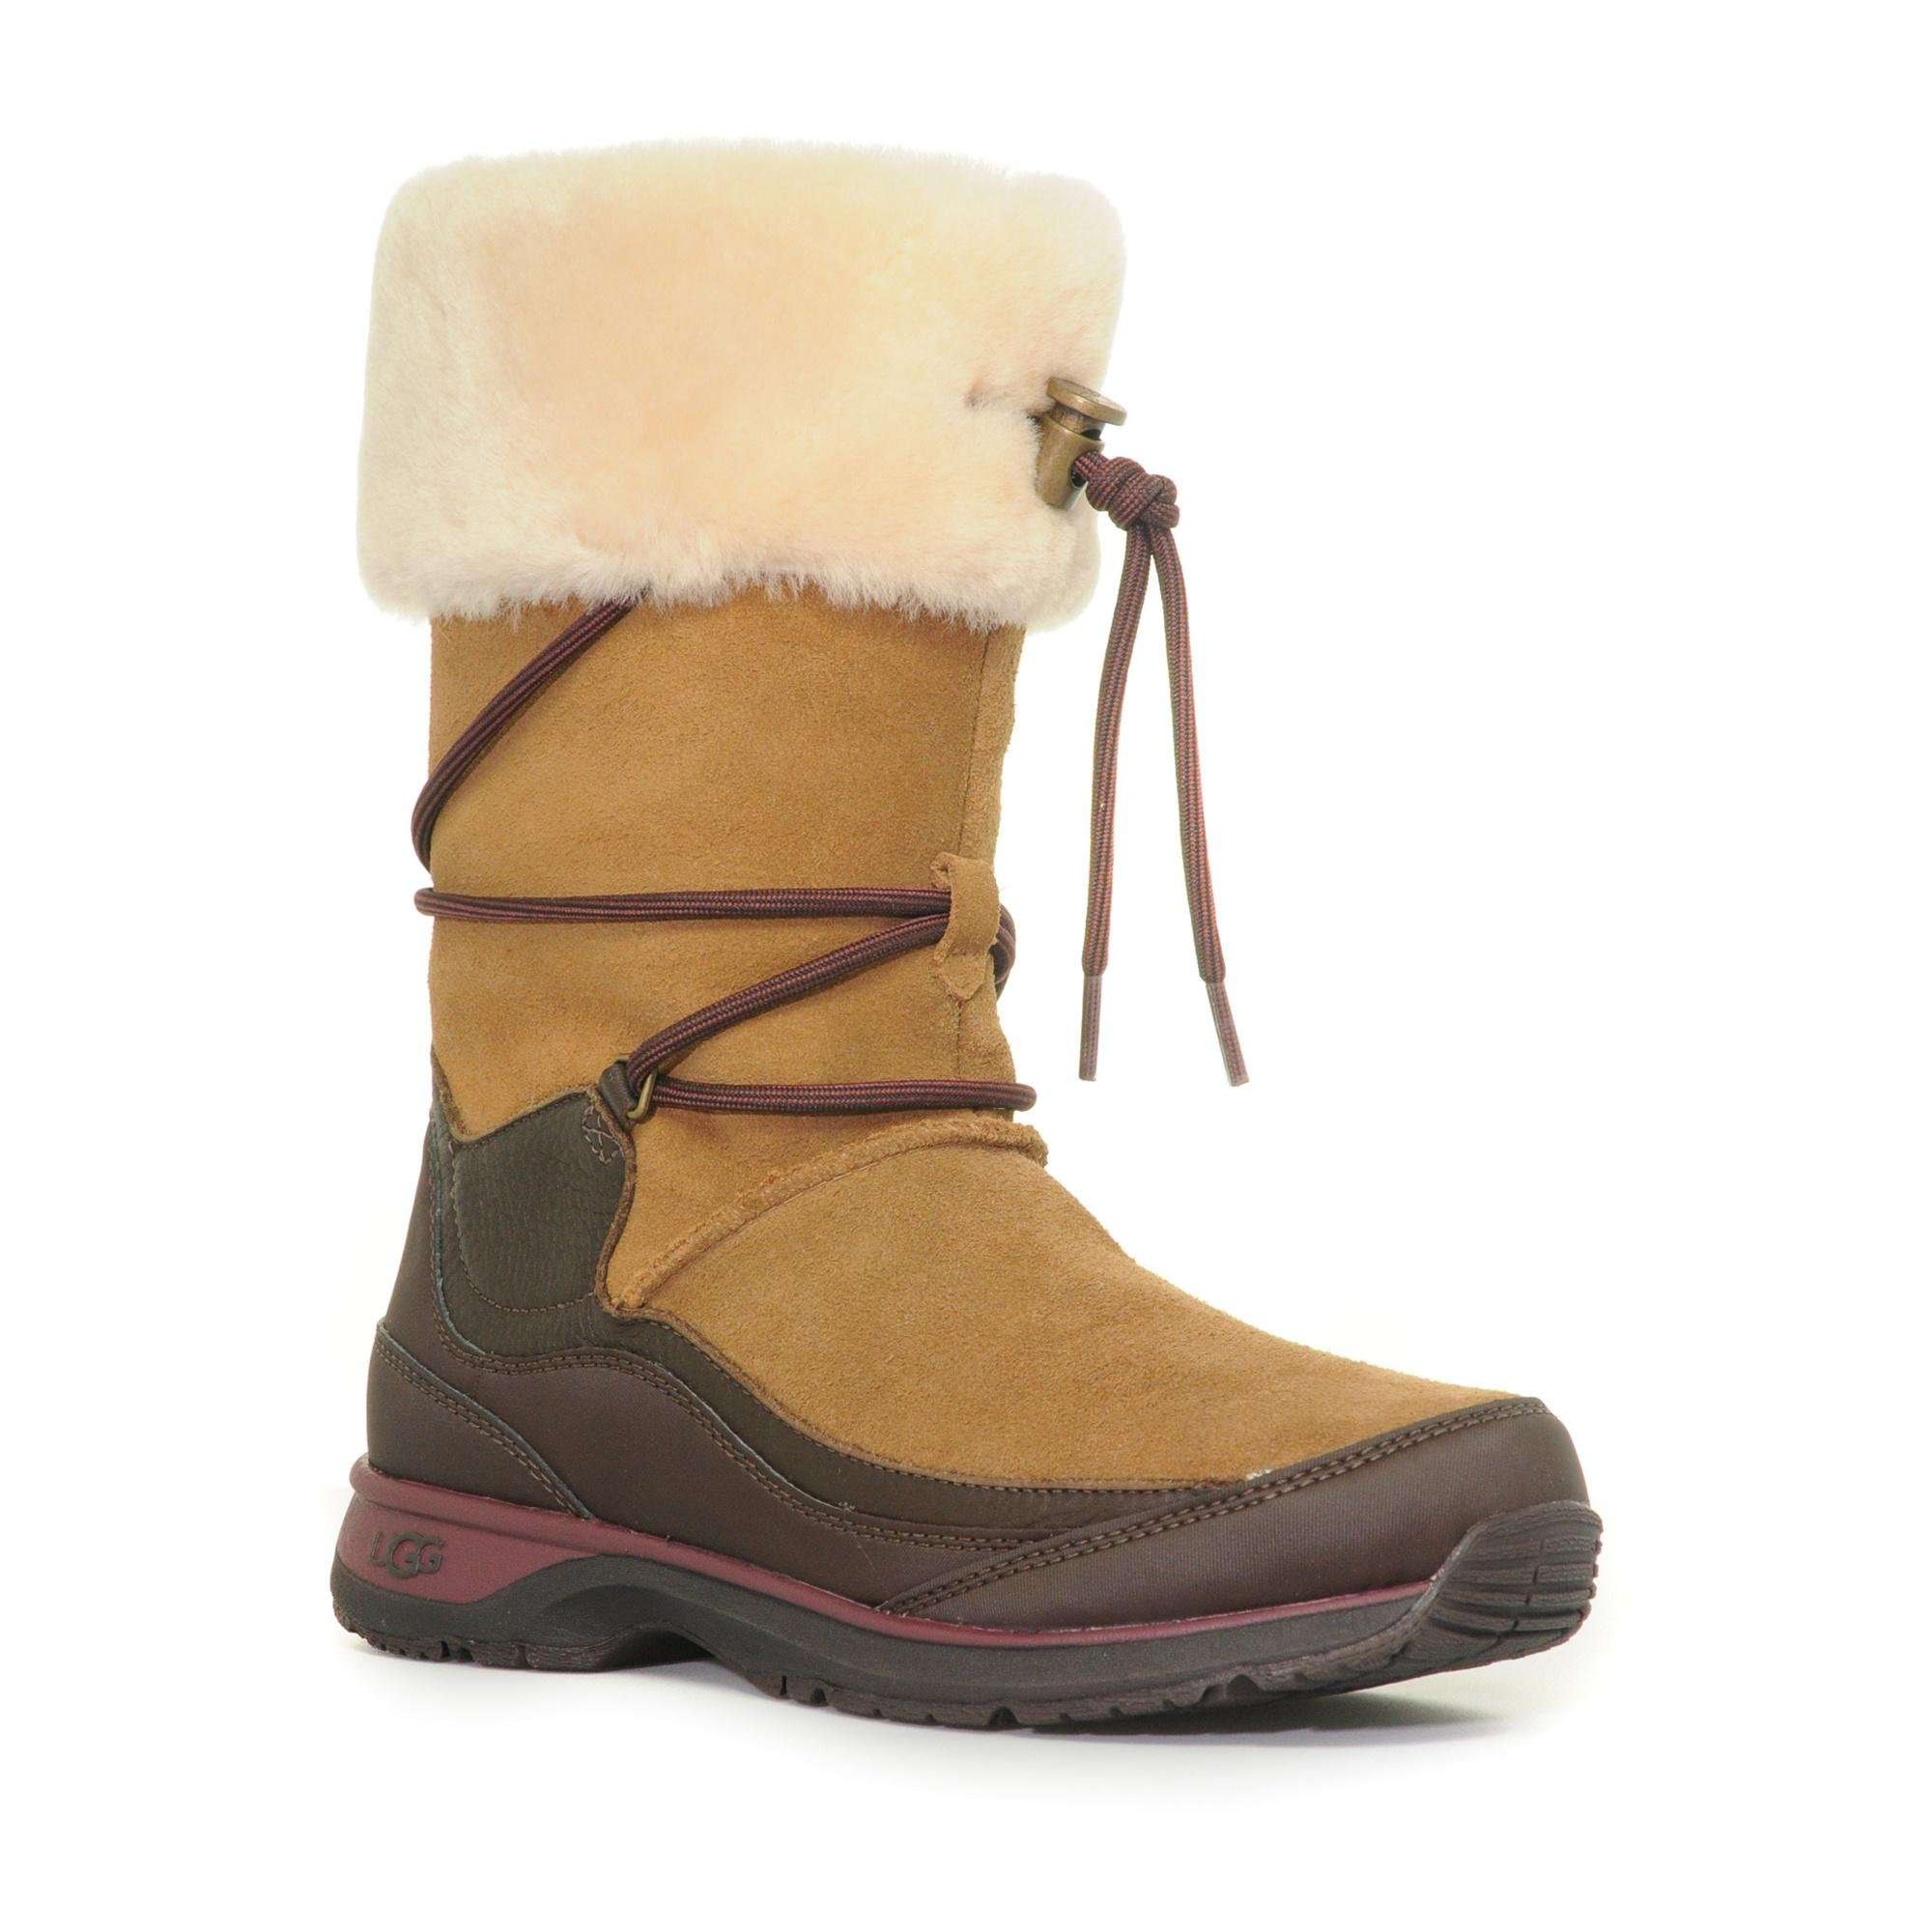 UGG Women's Orrellen Winter Boot